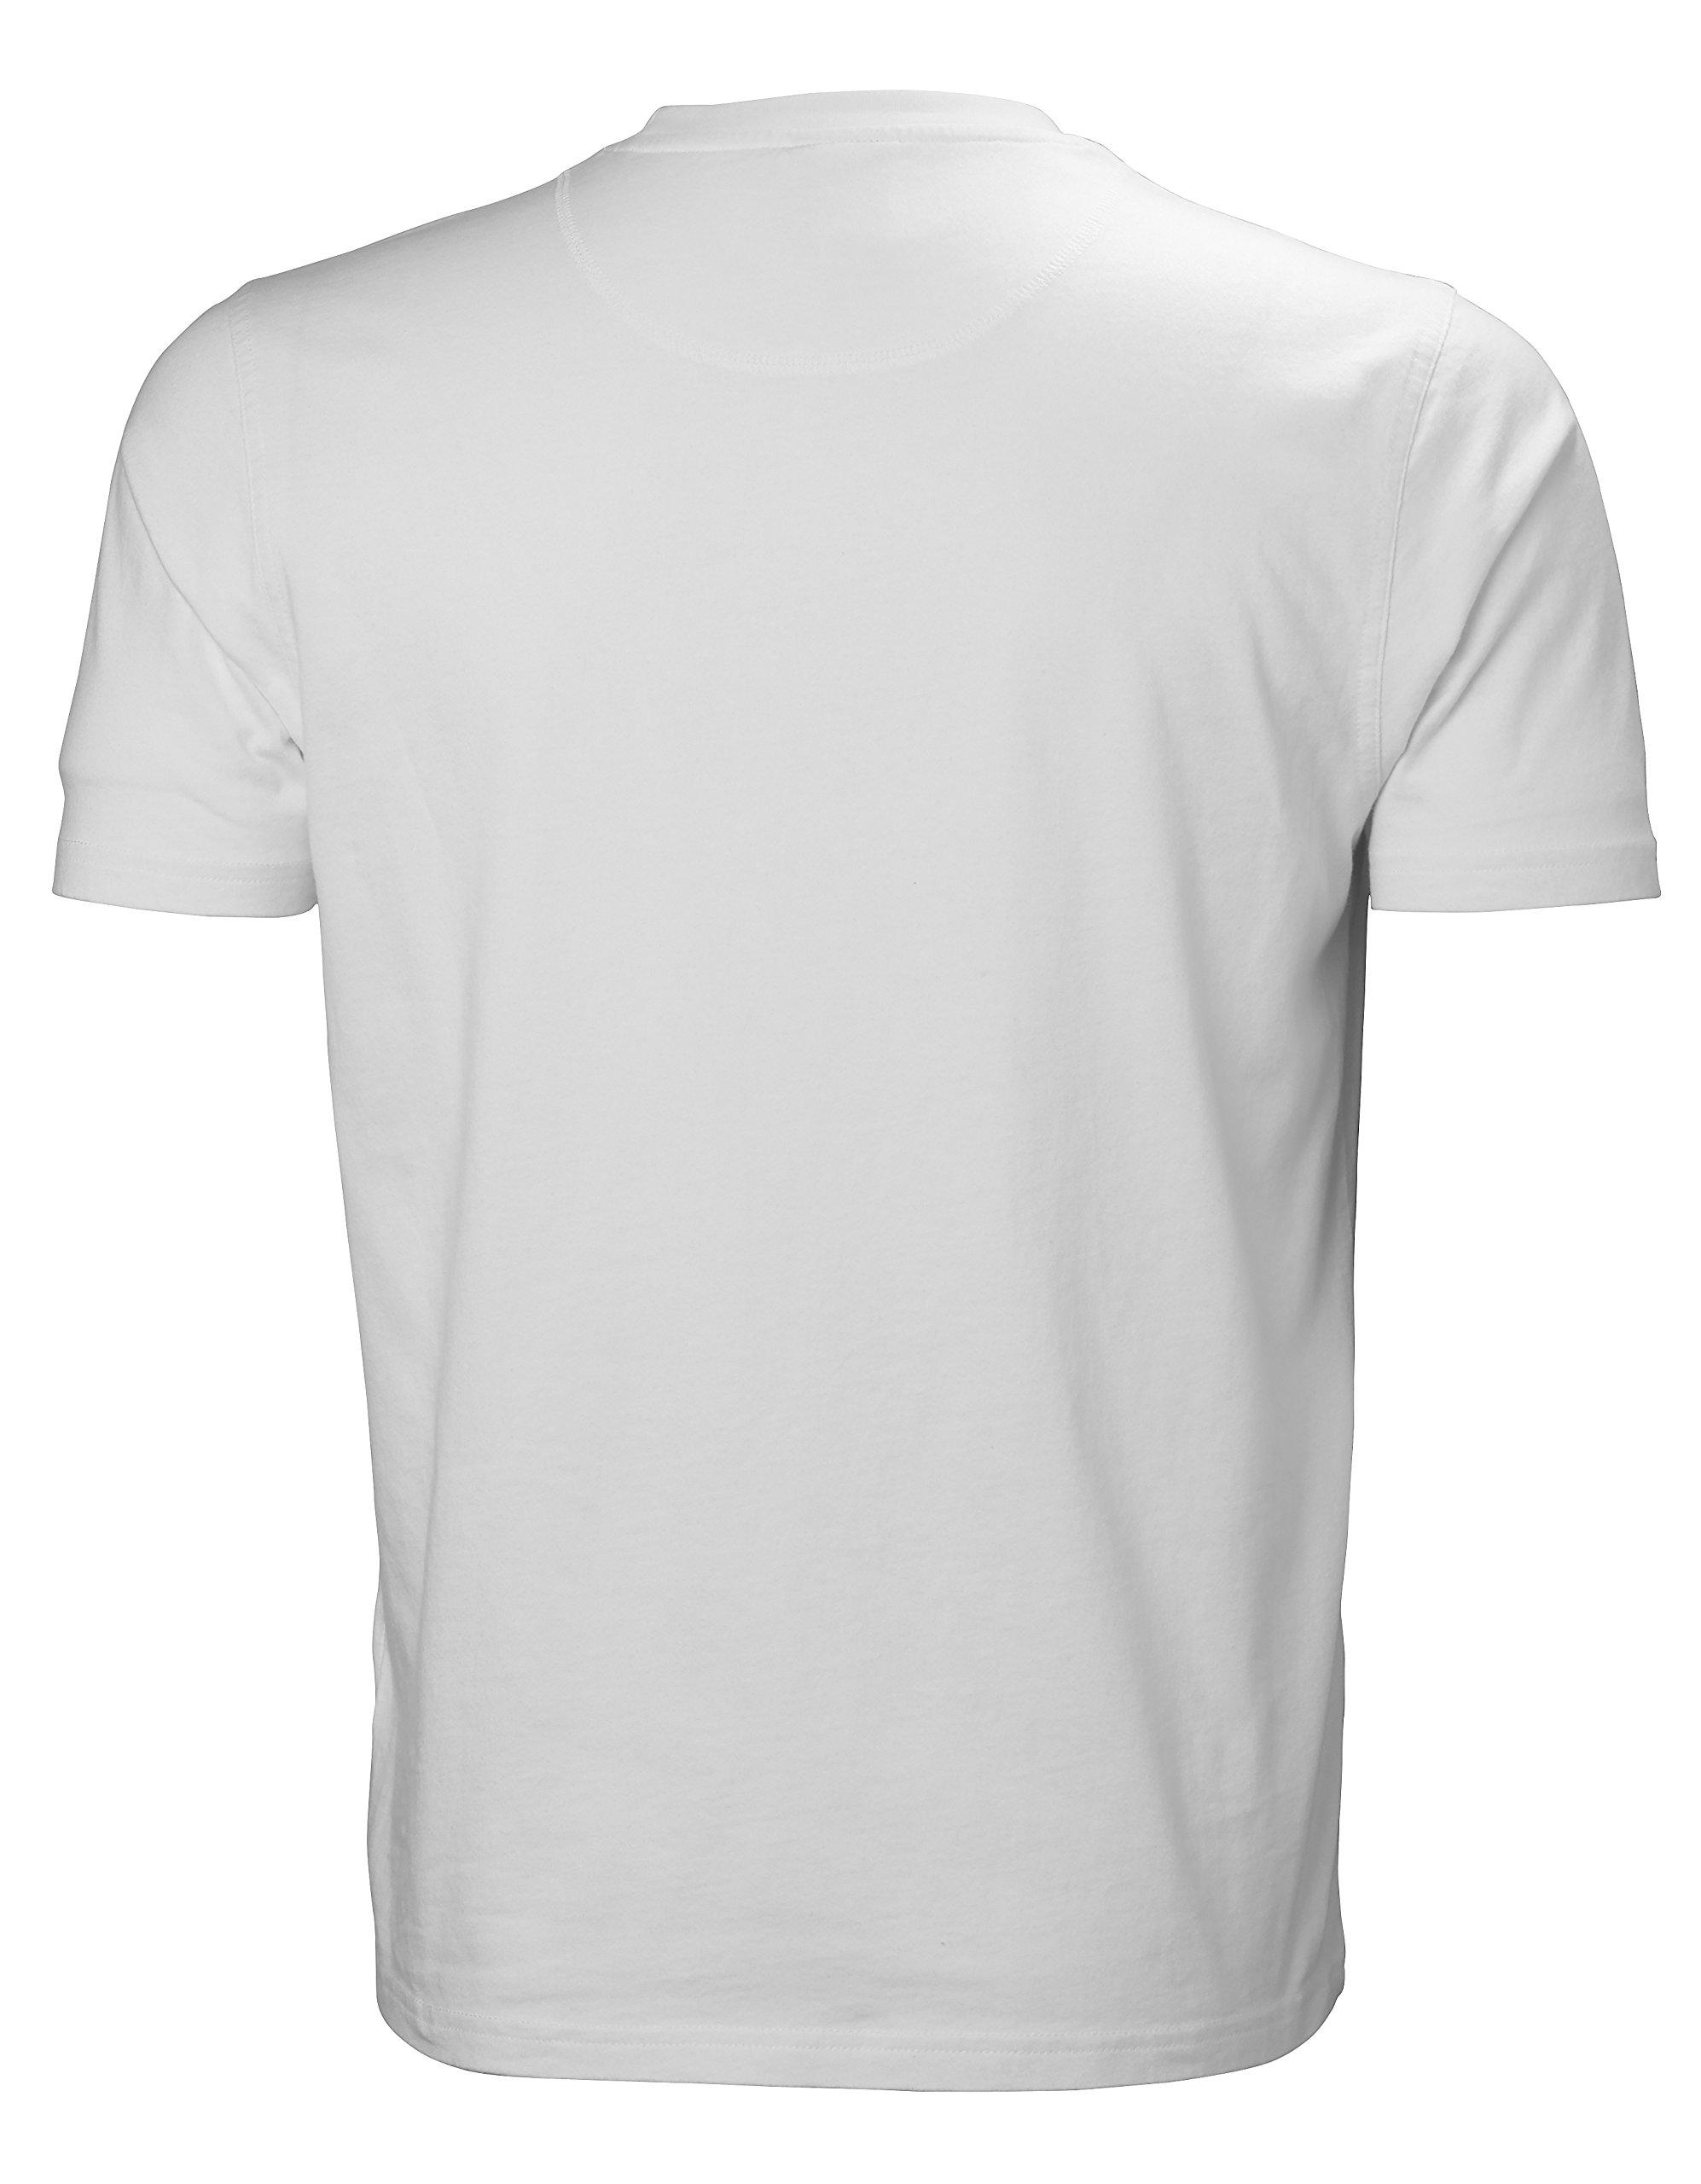 71PgqWPzzHL - Helly Hansen Men's Hh Norse Ss t-Shirt